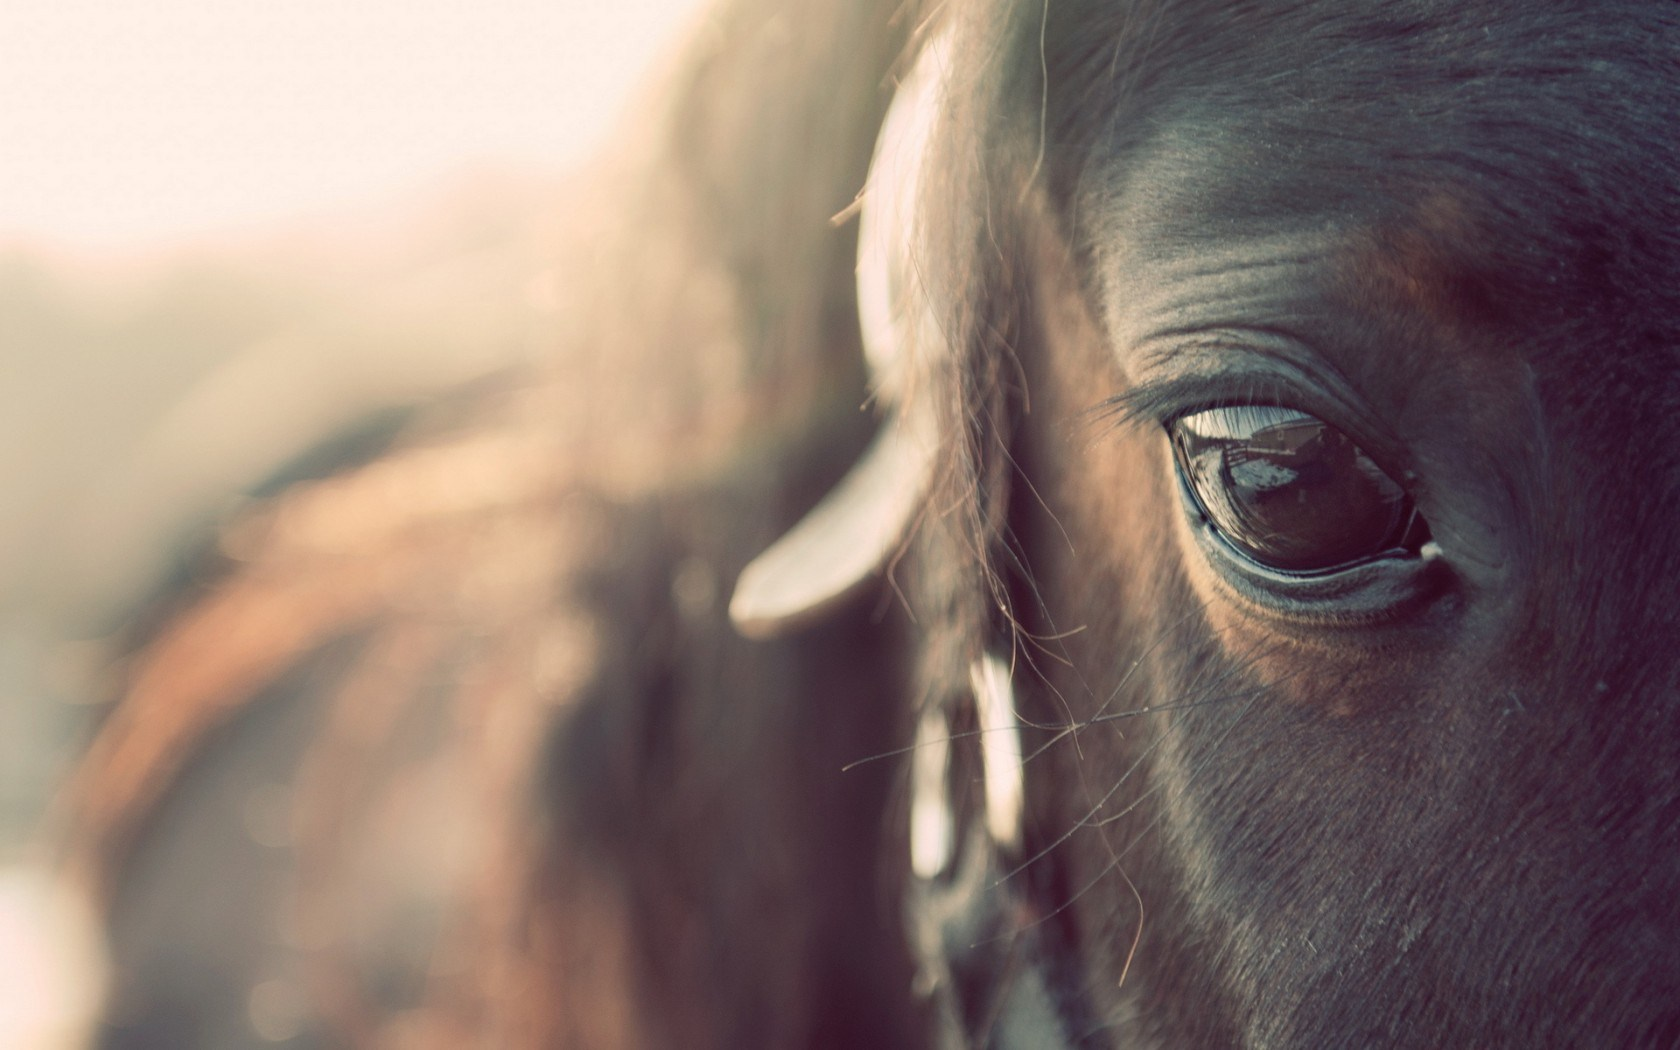 Horses Pictures A23 - Hd Desktop Wallpapers  4K Hd-9013